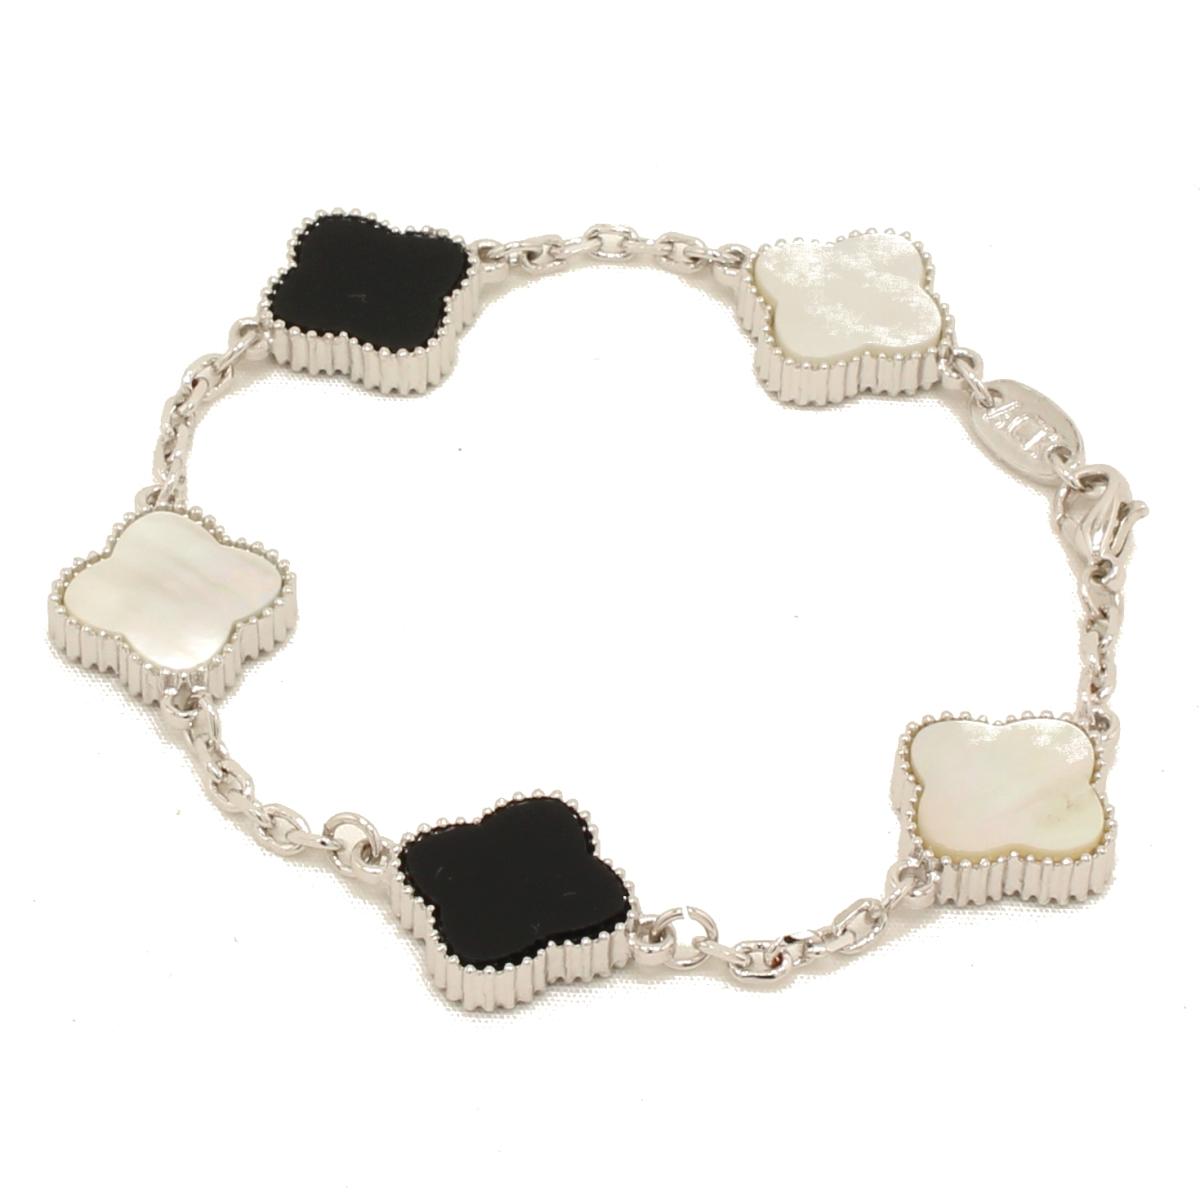 accessorykanon | Rakuten Global Market: Mil gold flower bracelet ...